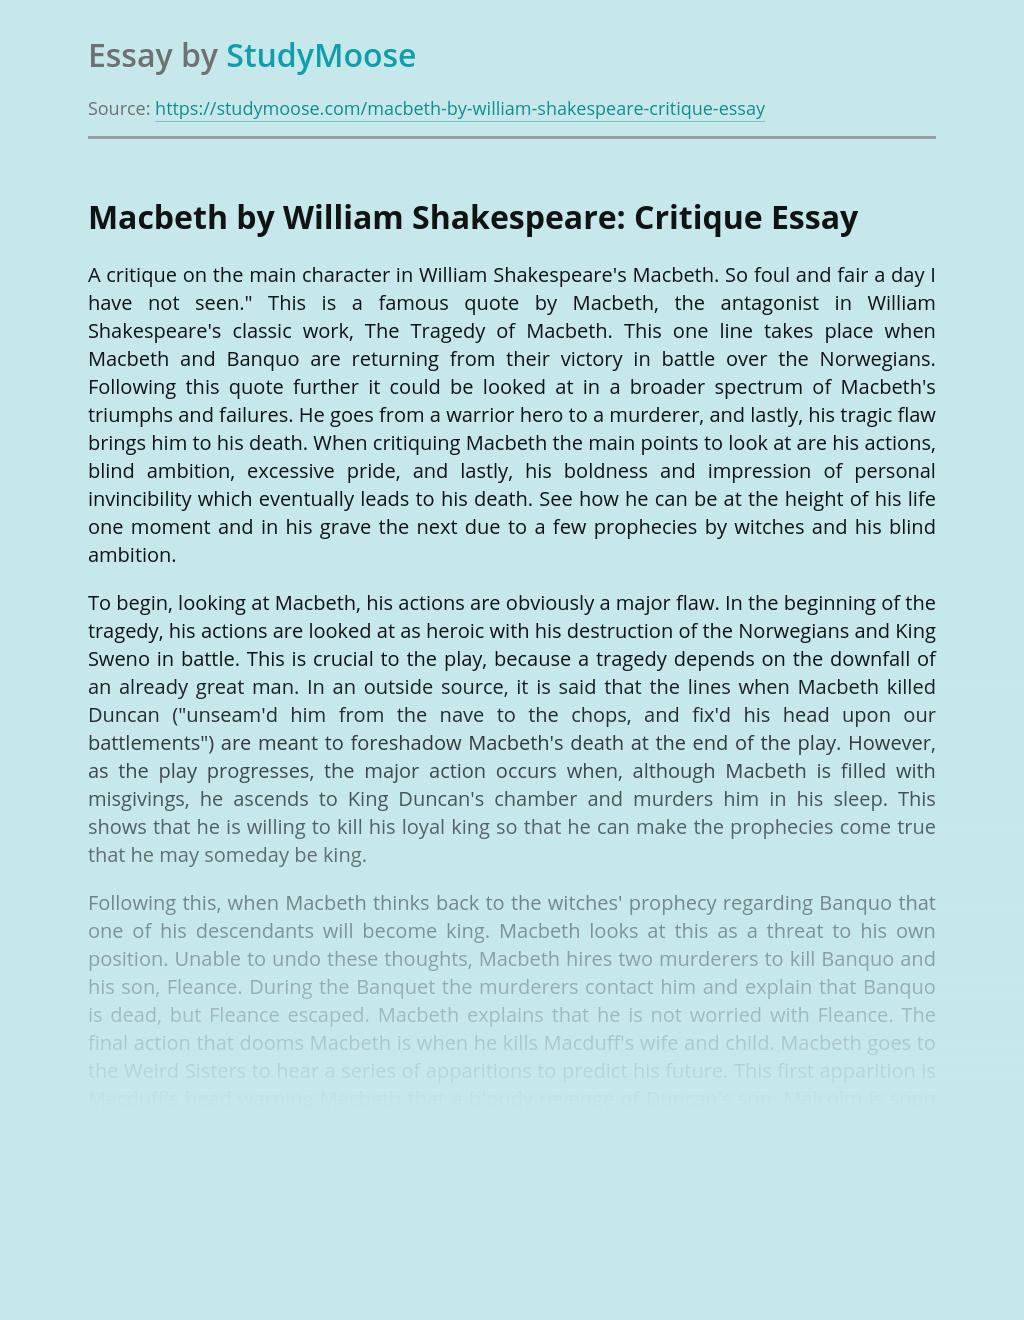 Macbeth by William Shakespeare: Critique